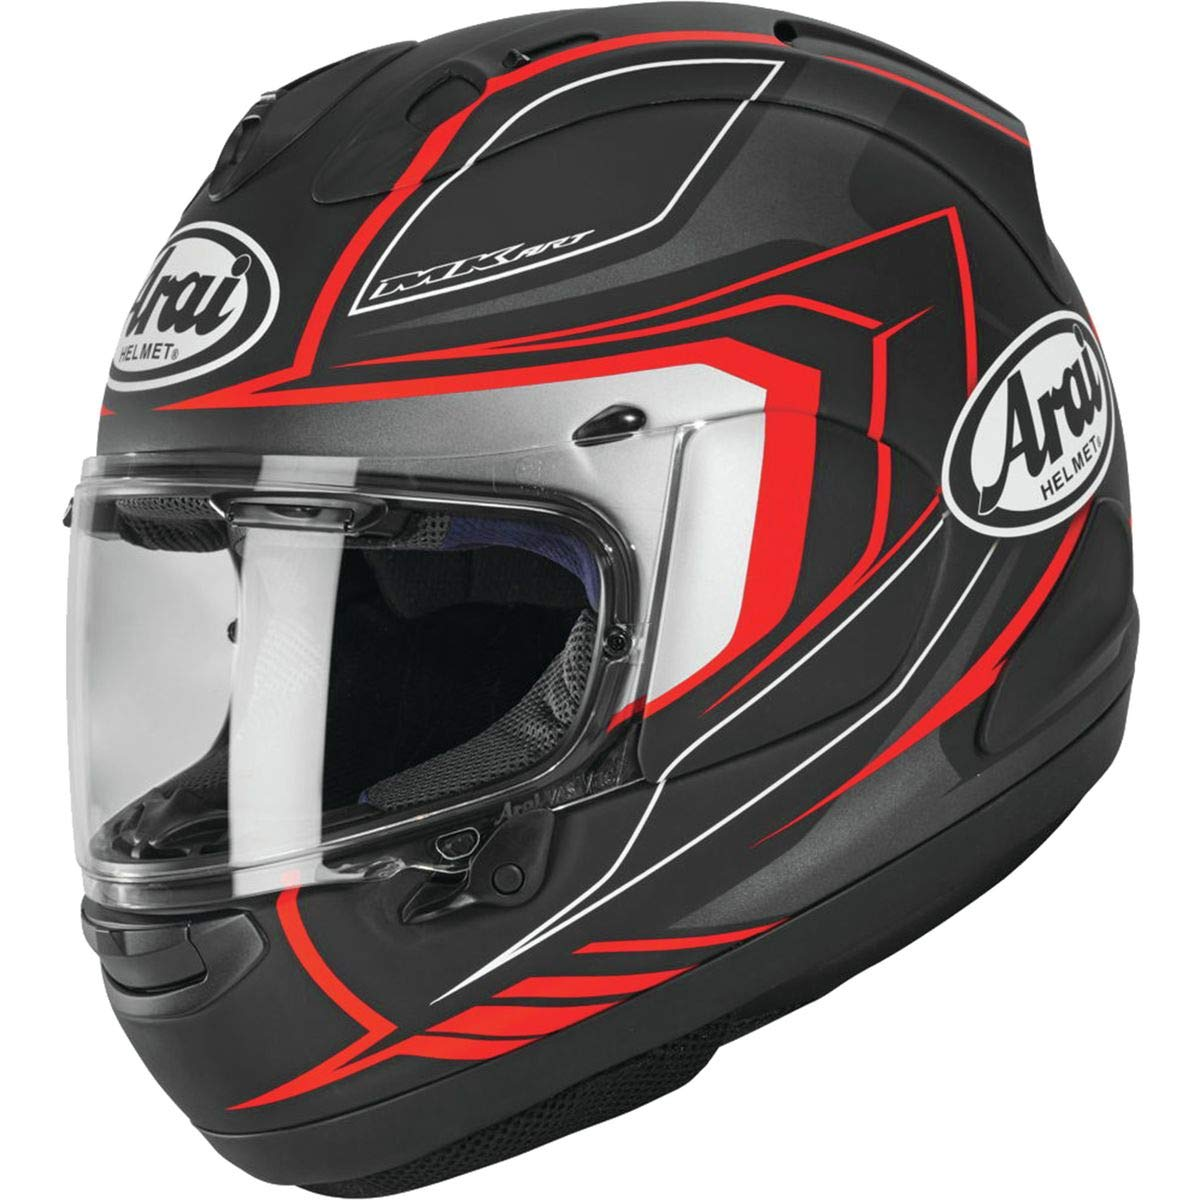 Arai Corsair X Helmet - Bracket